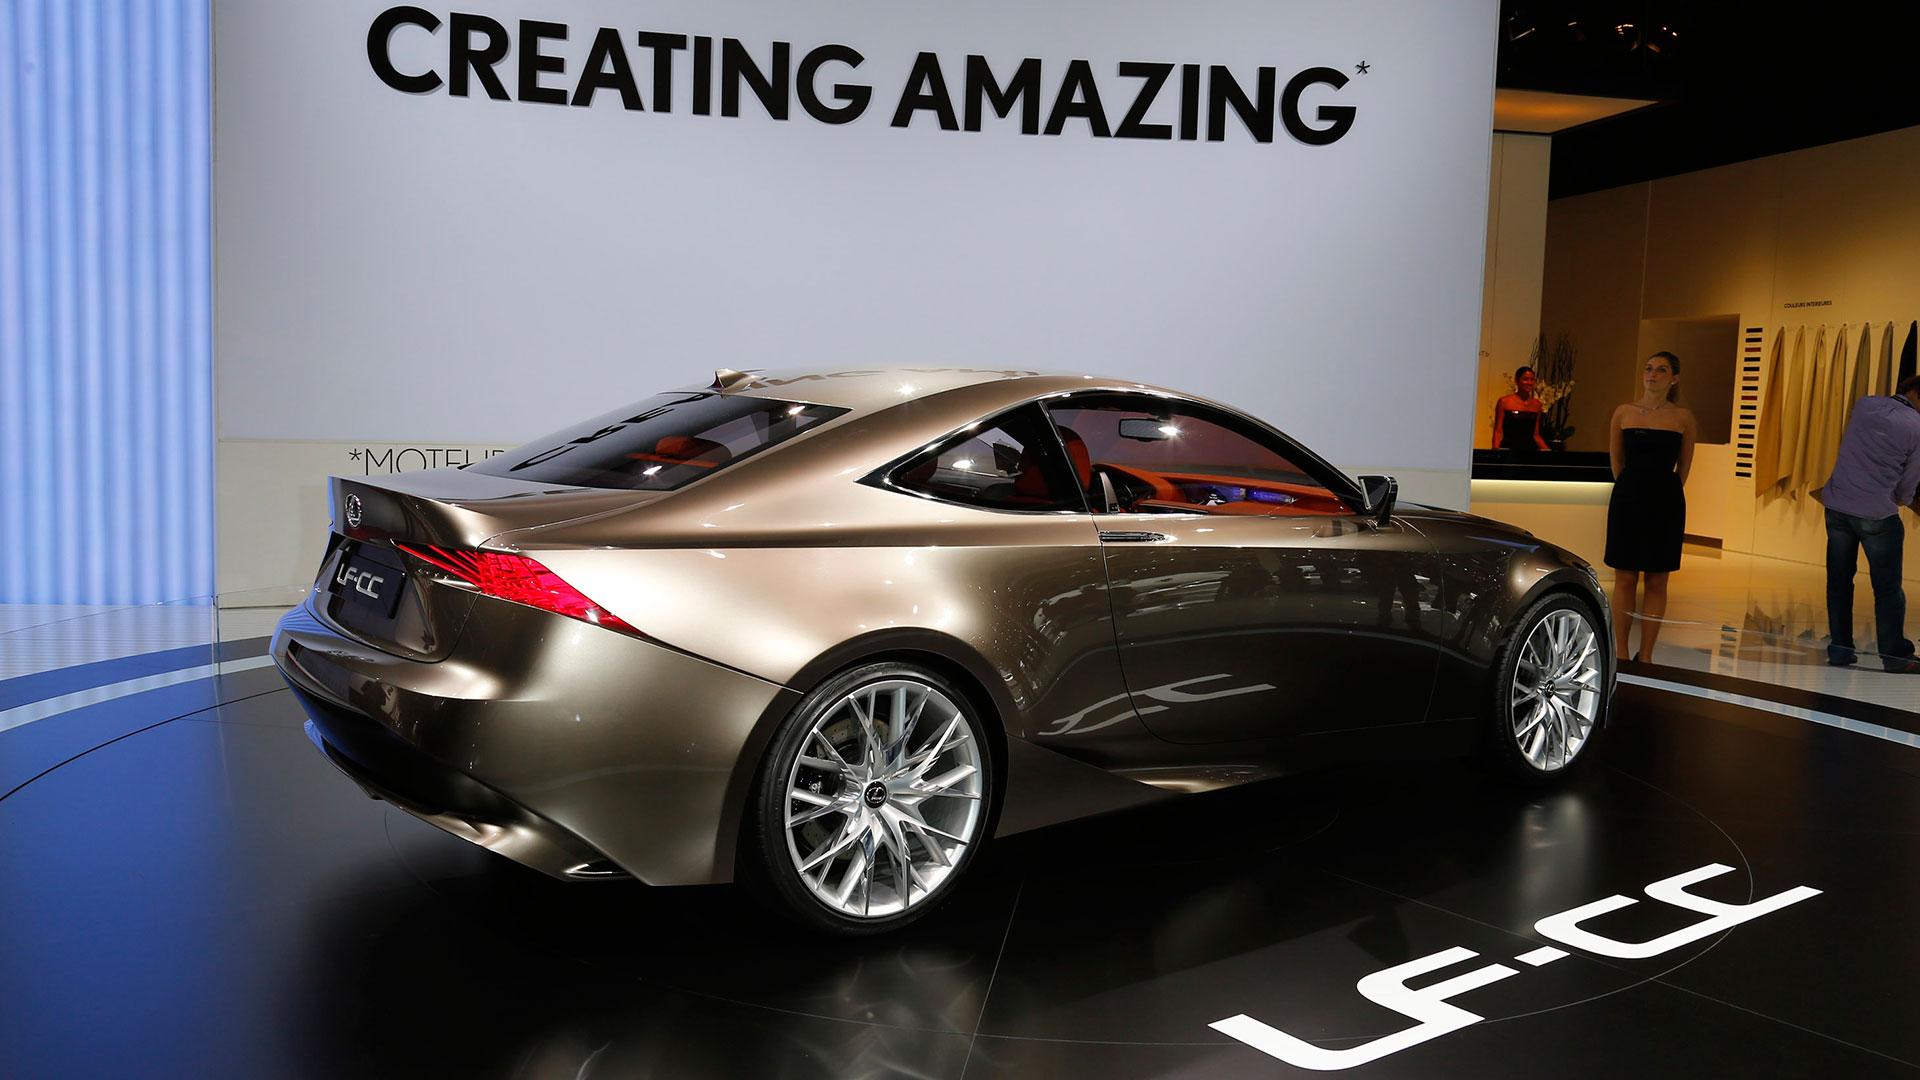 Concept car Lexus LF CC en el Paríss hero asset